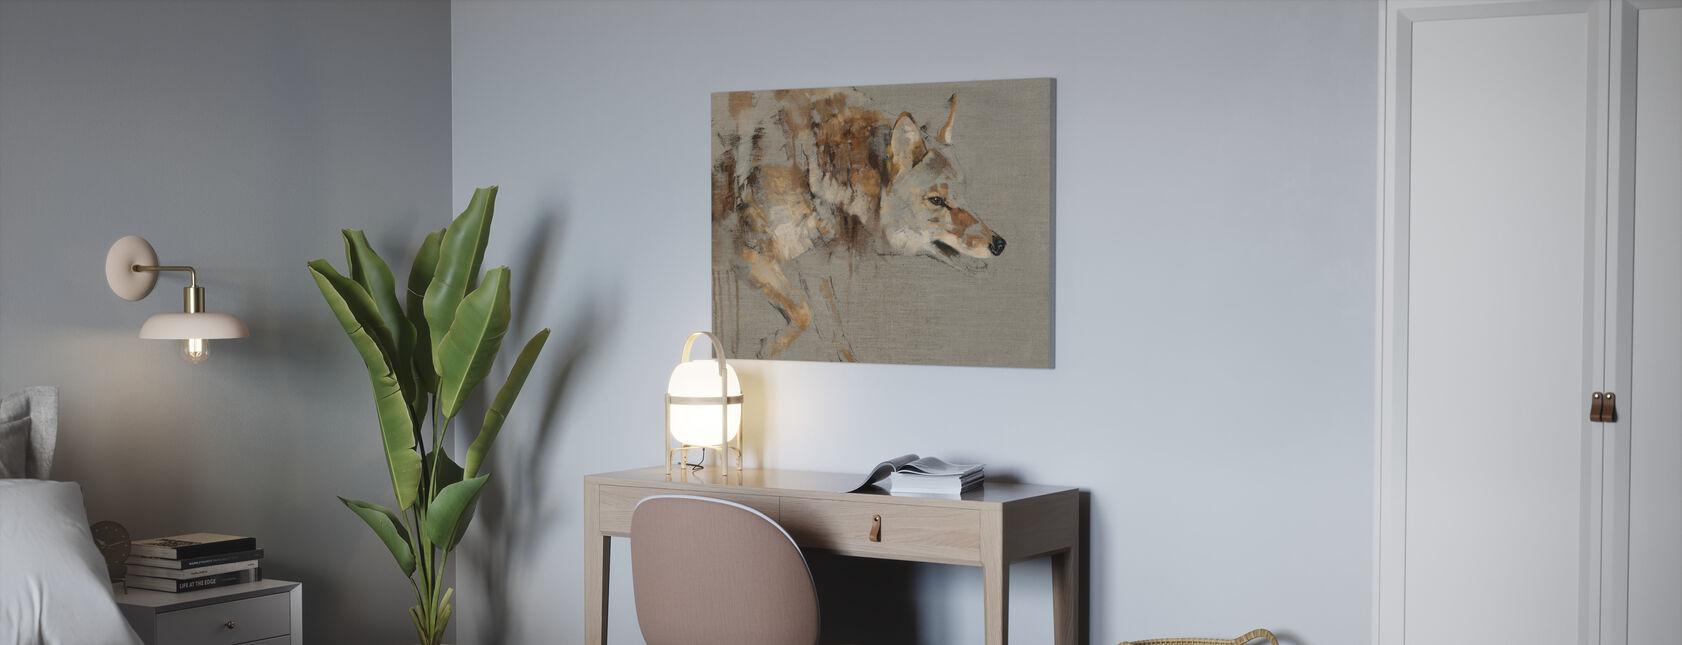 The Drifter - Canvas print - Office